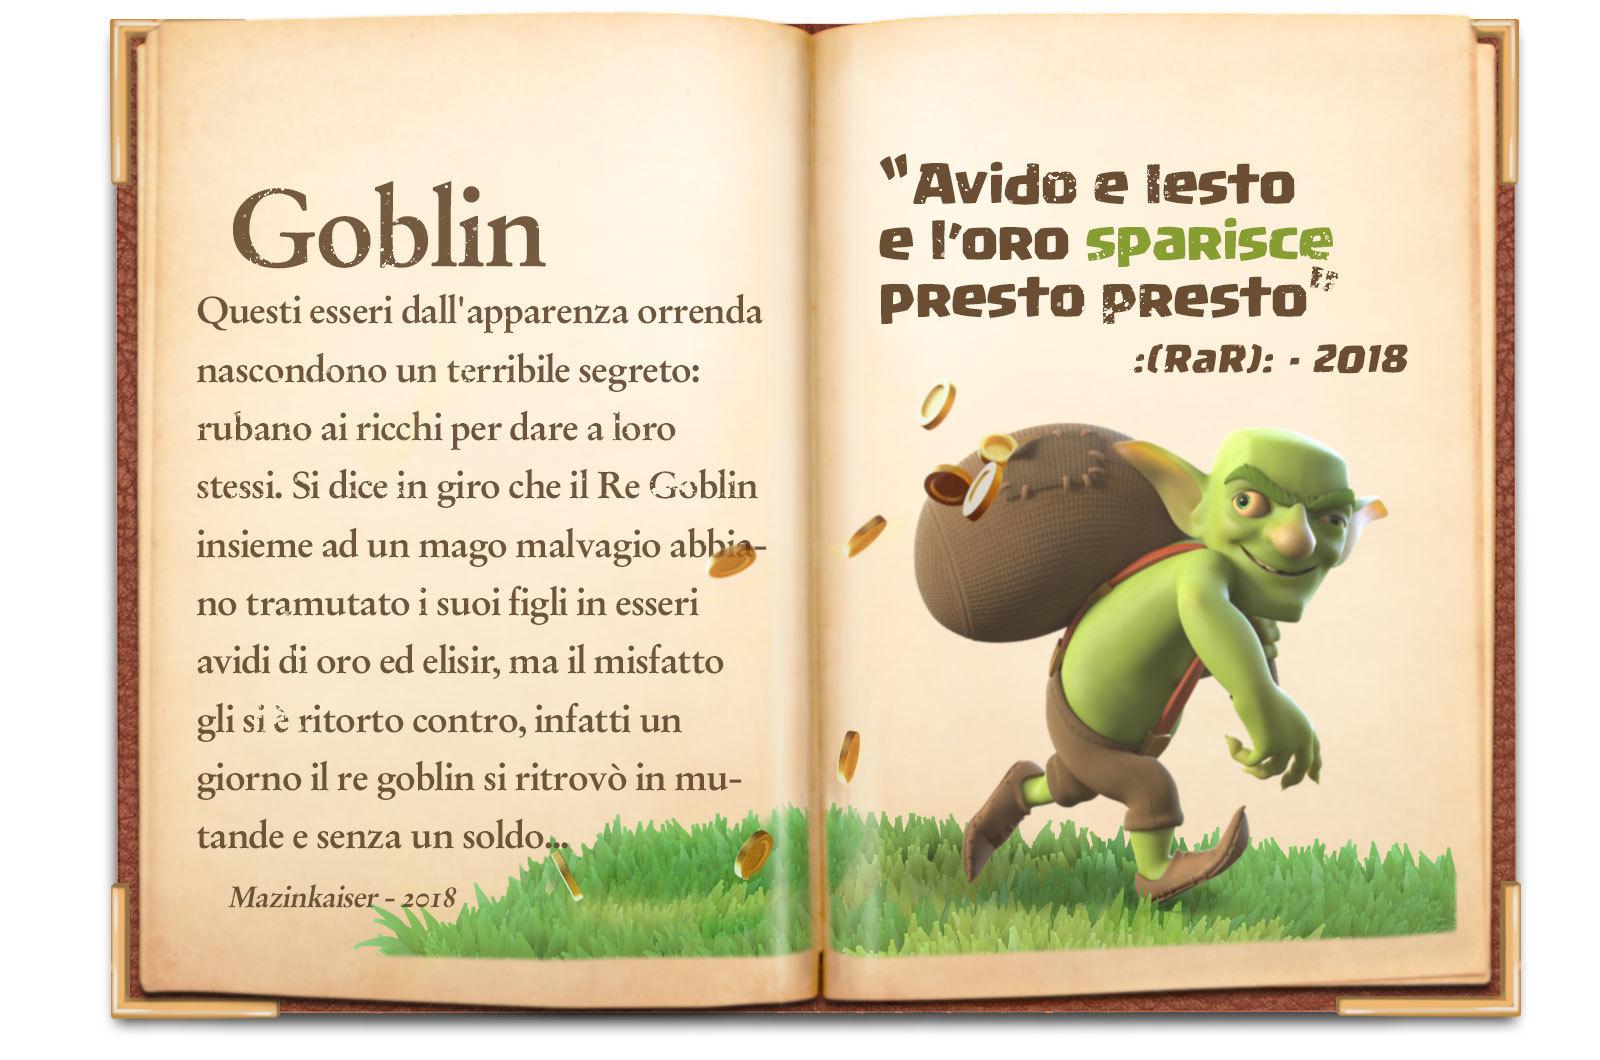 Ita_CoC_Clanslator_Book_1_GoblinFull.jpg?mtime=20180601060642#asset:5854